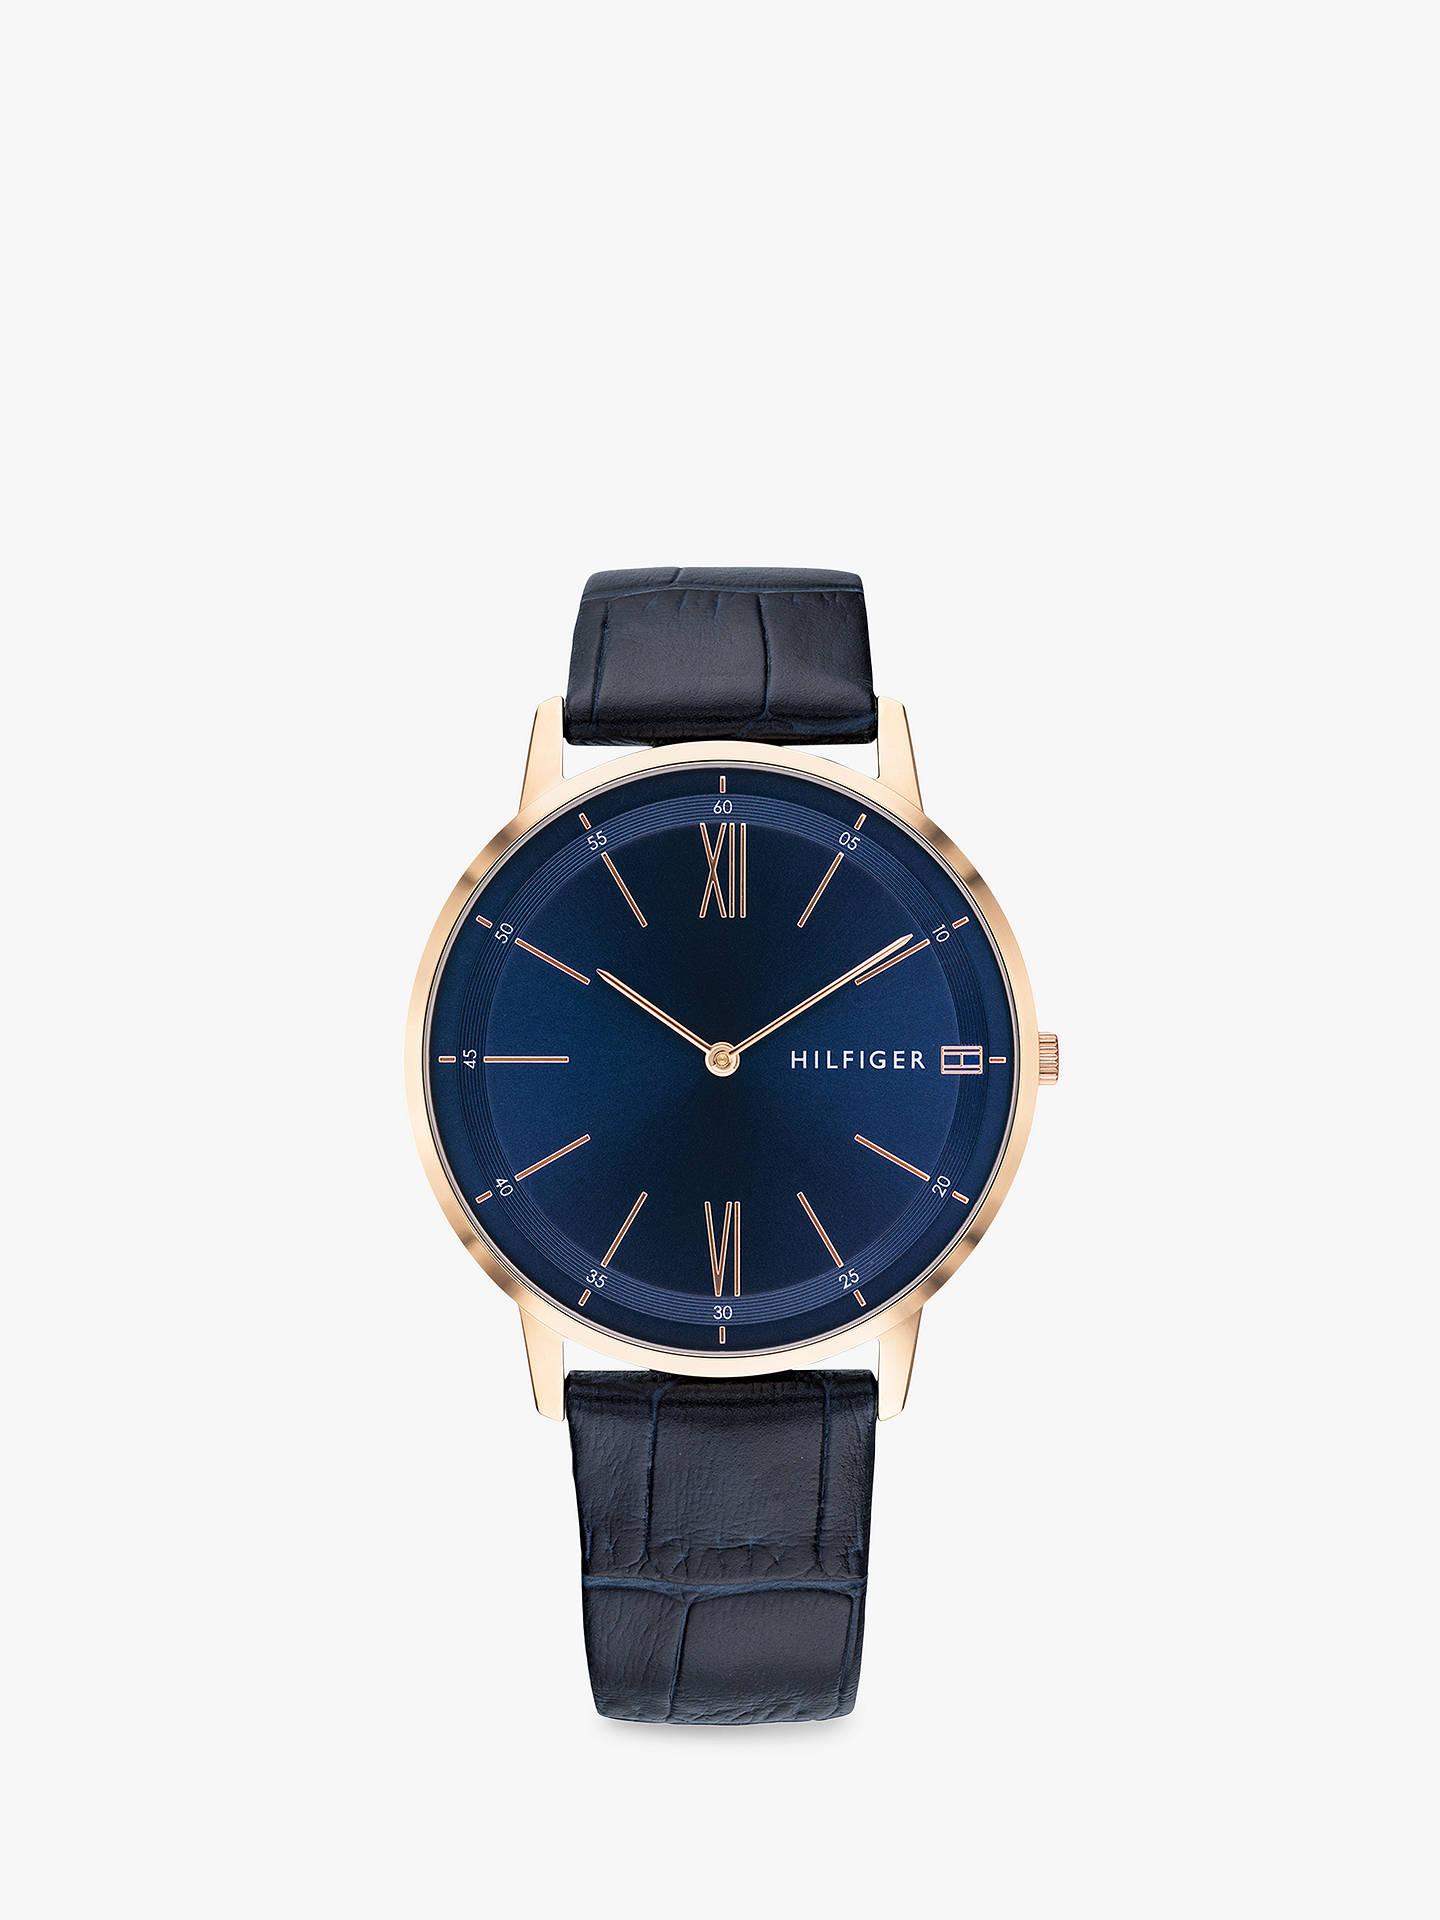 ef66a53d7de815 Buy Tommy Hilfiger 1791515 Men s Cooper Leather Strap Watch